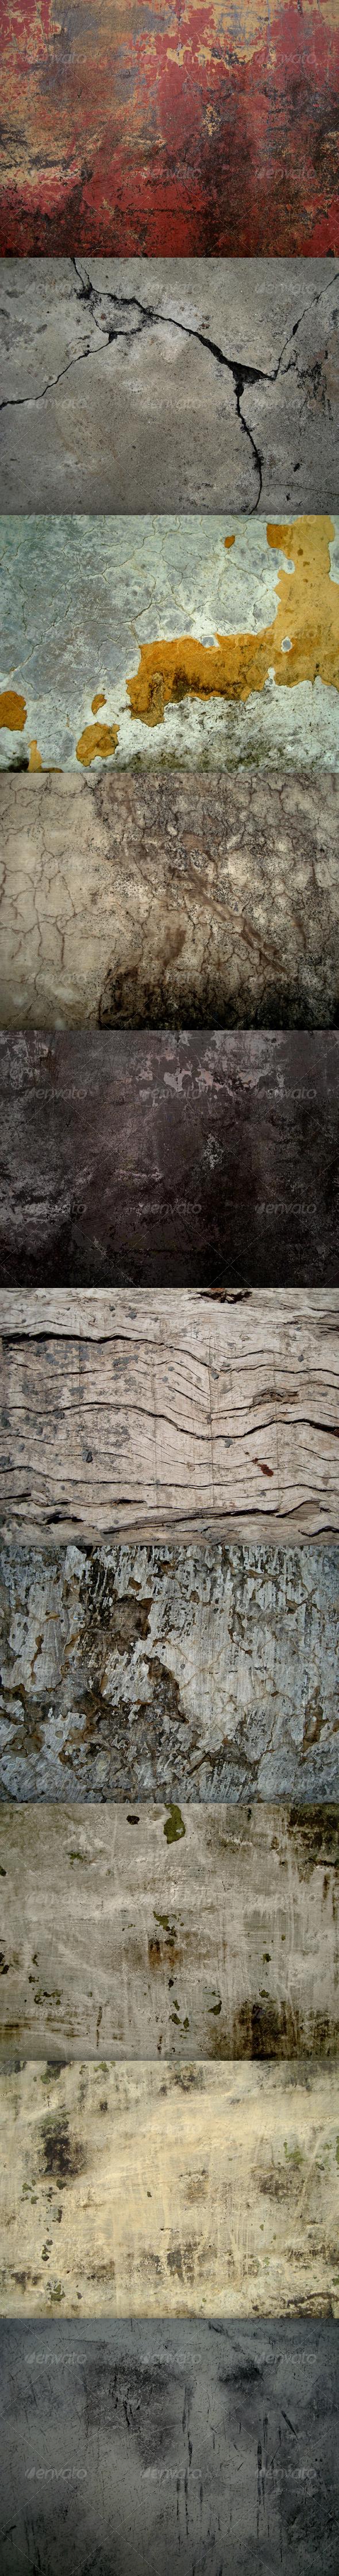 Grunge Textures pack - Industrial / Grunge Textures